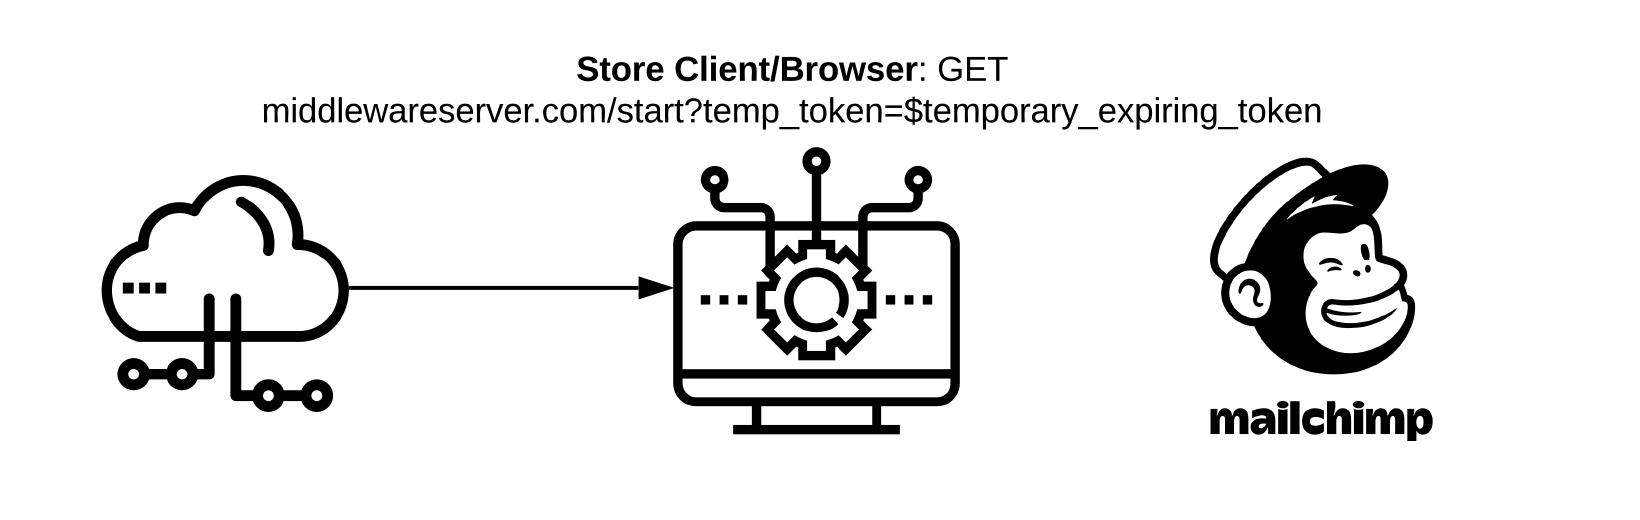 Browser: GET middlewareserver.com/start?temp_token=$temporary_expiring_token